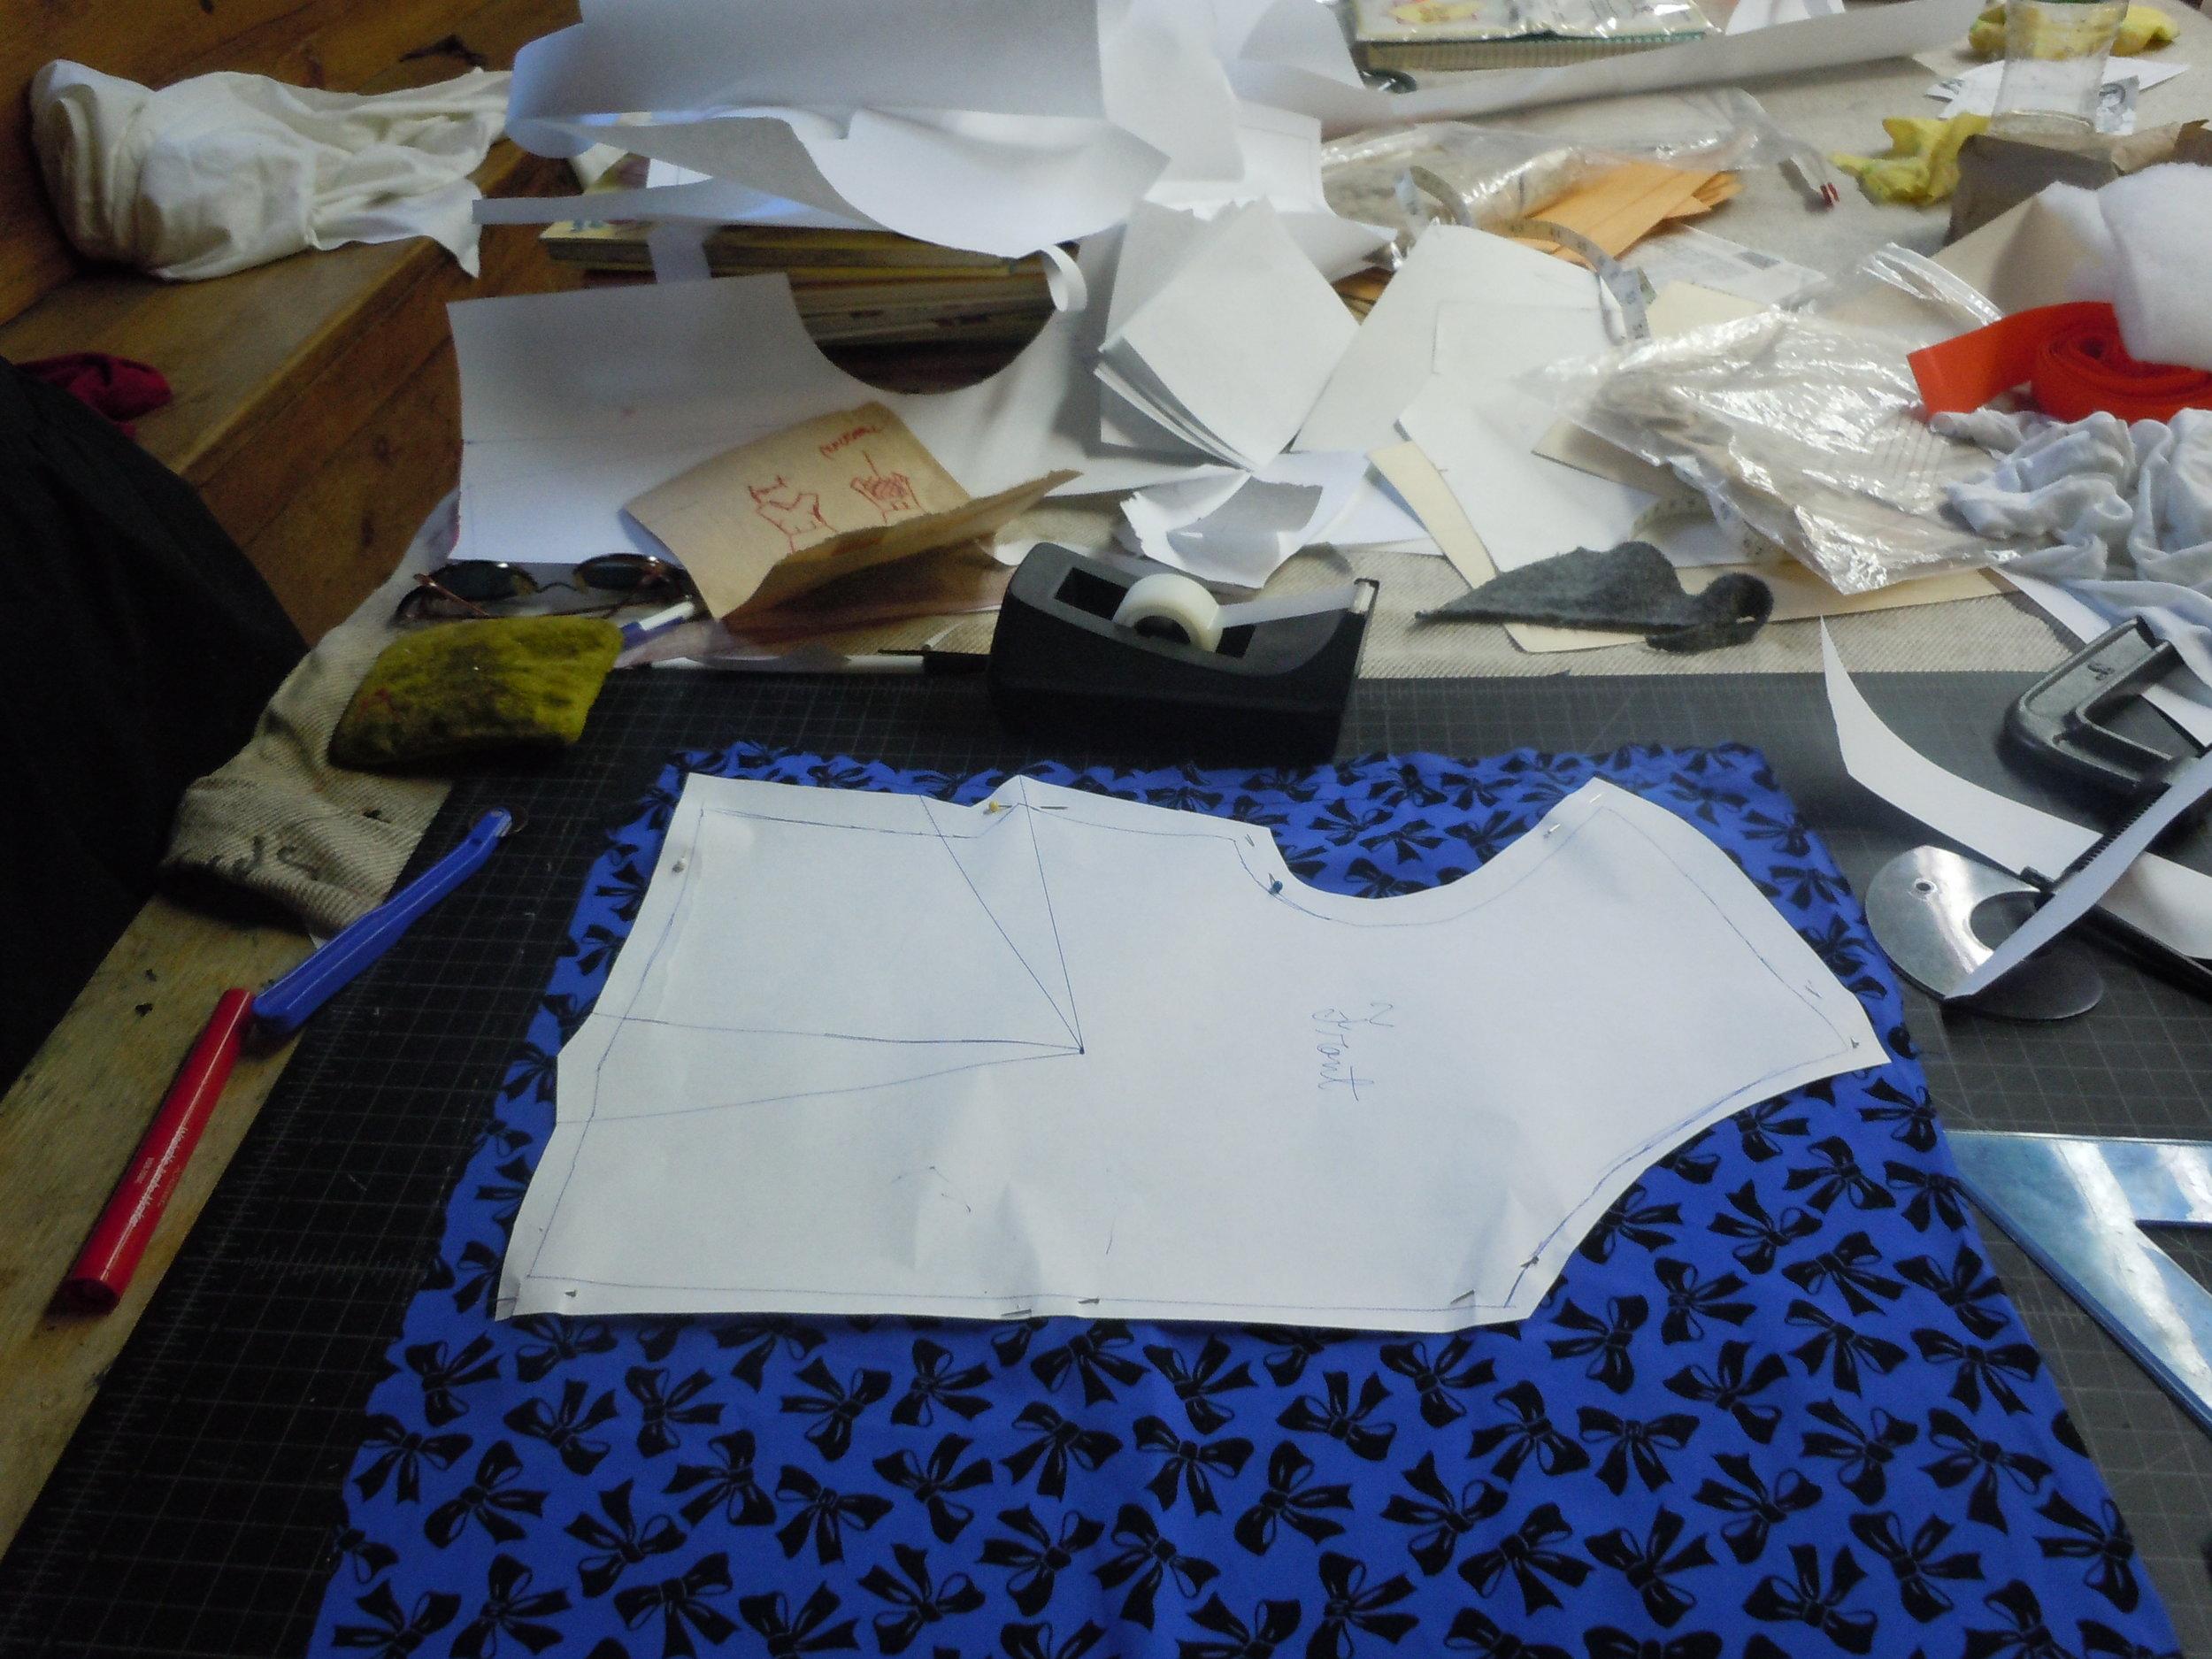 bodice-pattern_5064079138_o.jpg